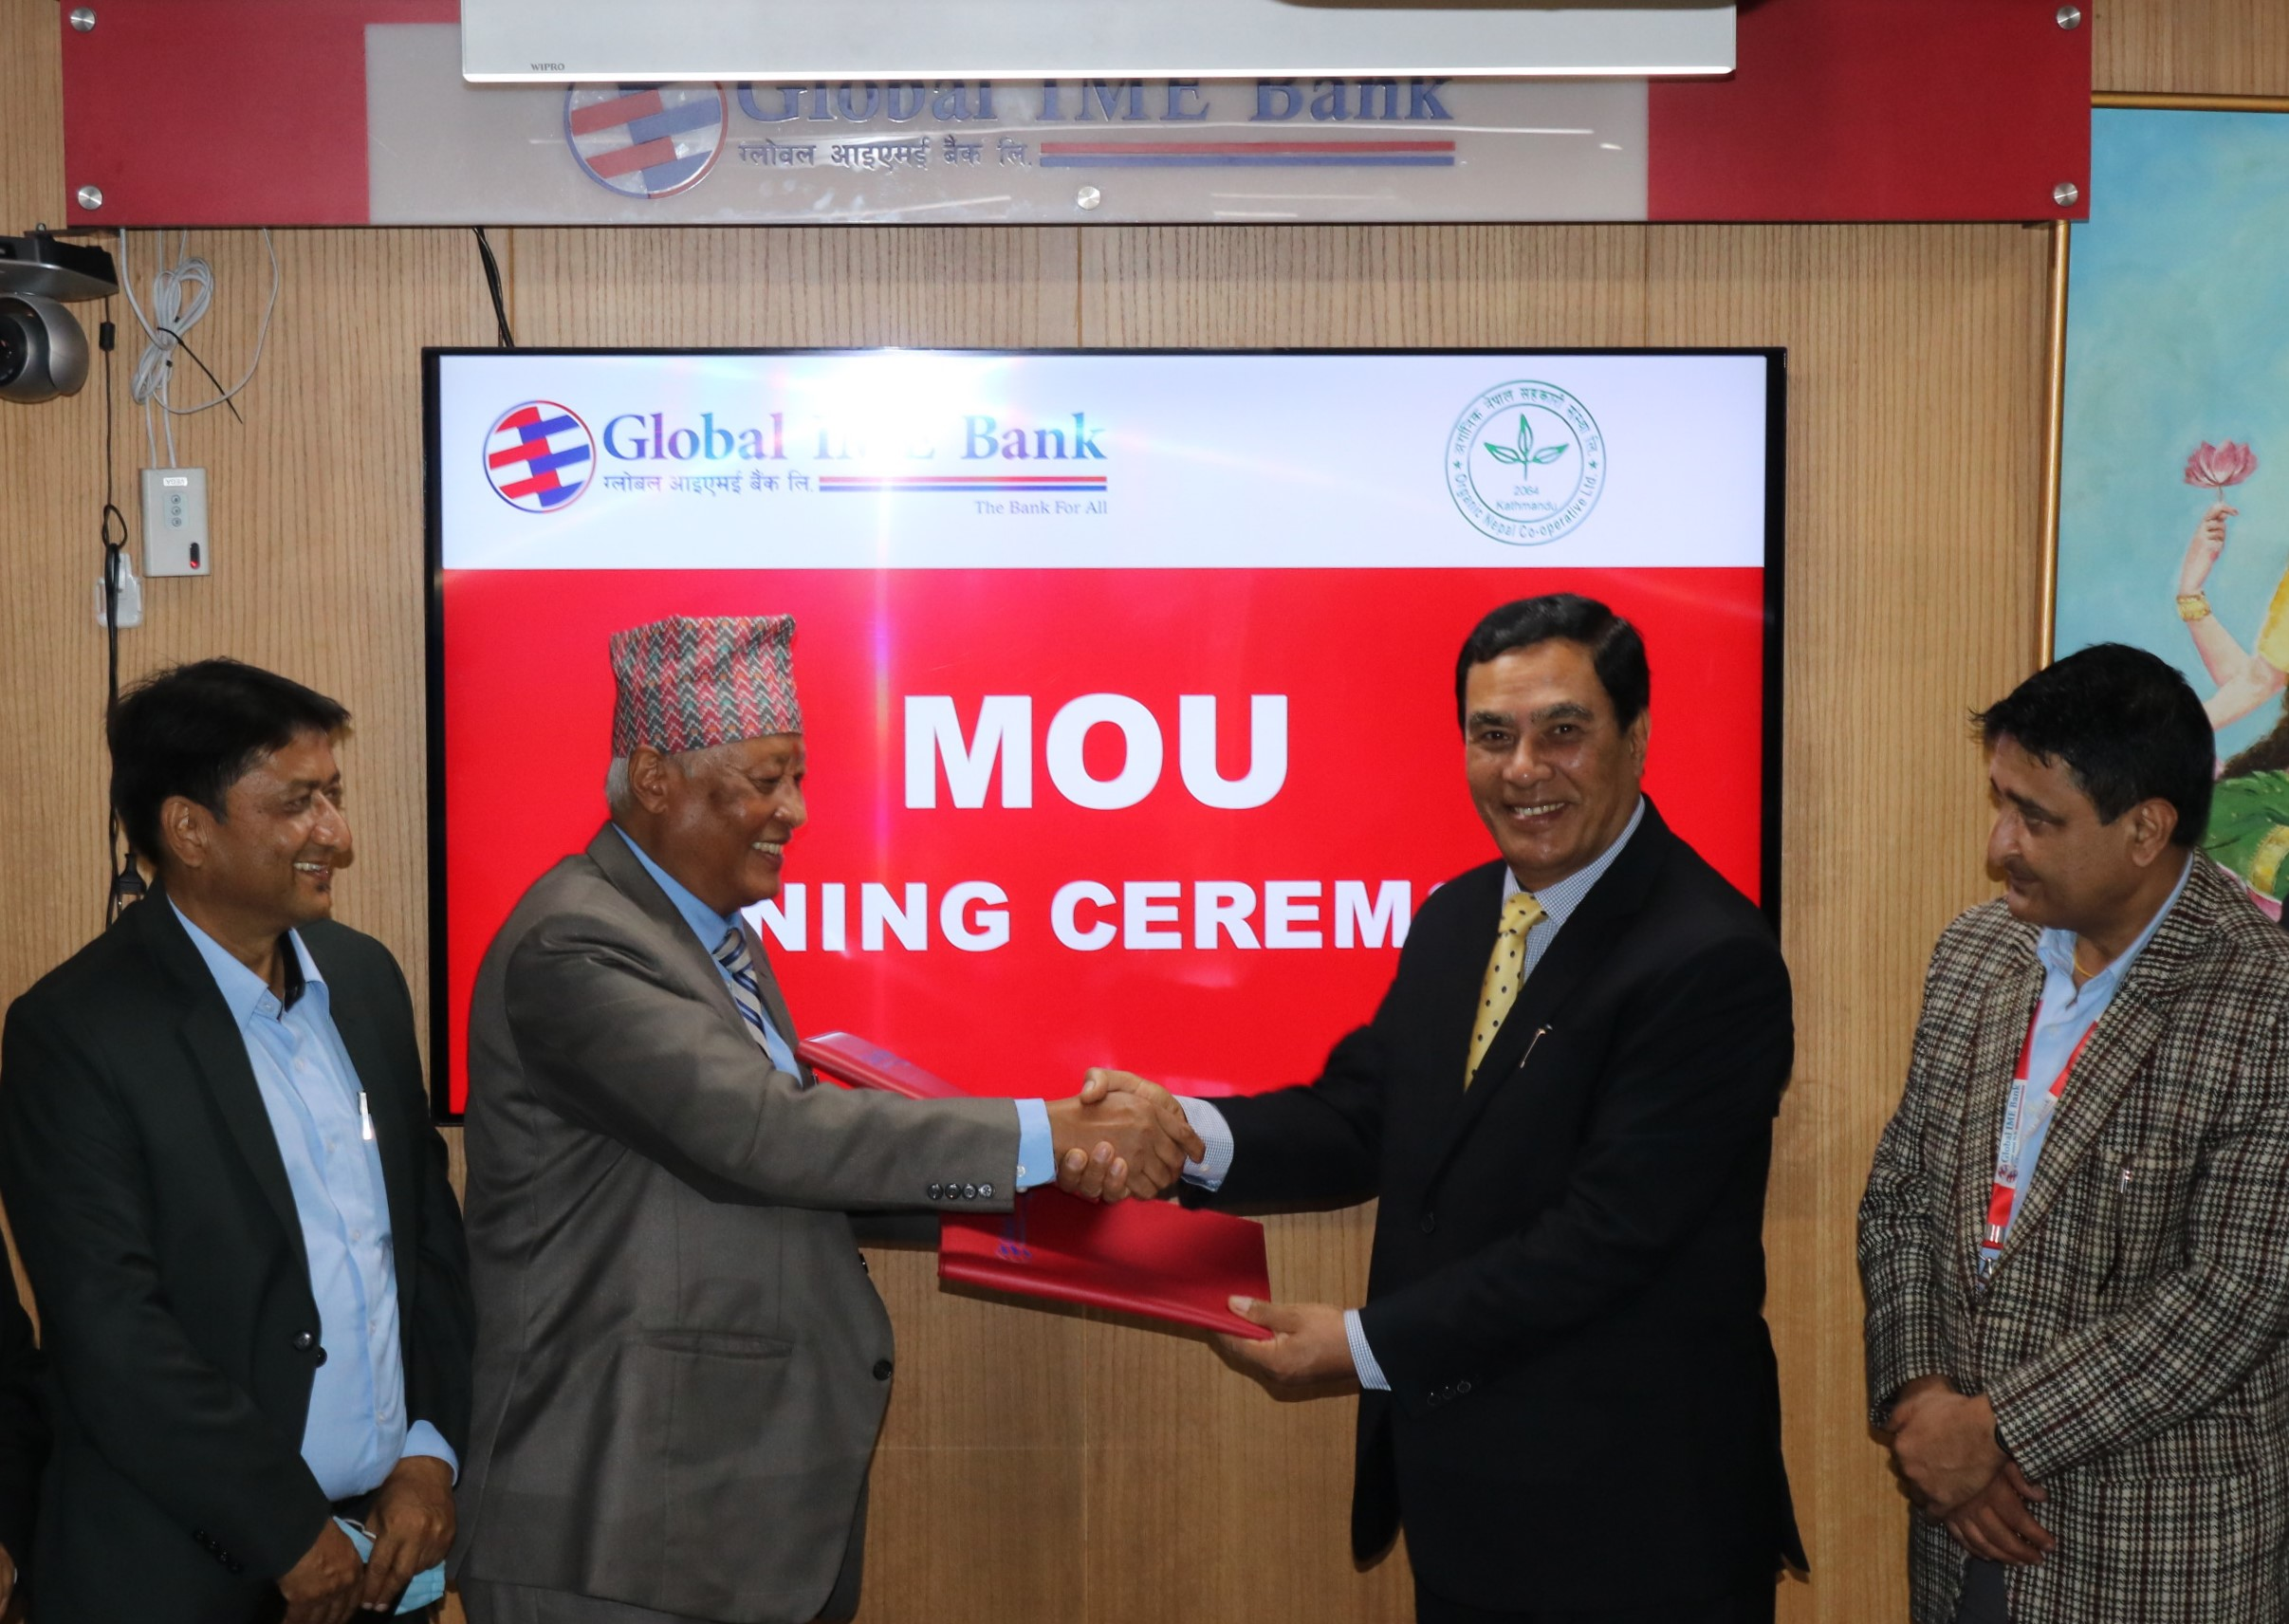 ग्लोबल आइएमई बैंक र अर्गानिक नेपाल सहकारीबीच सम्झौता